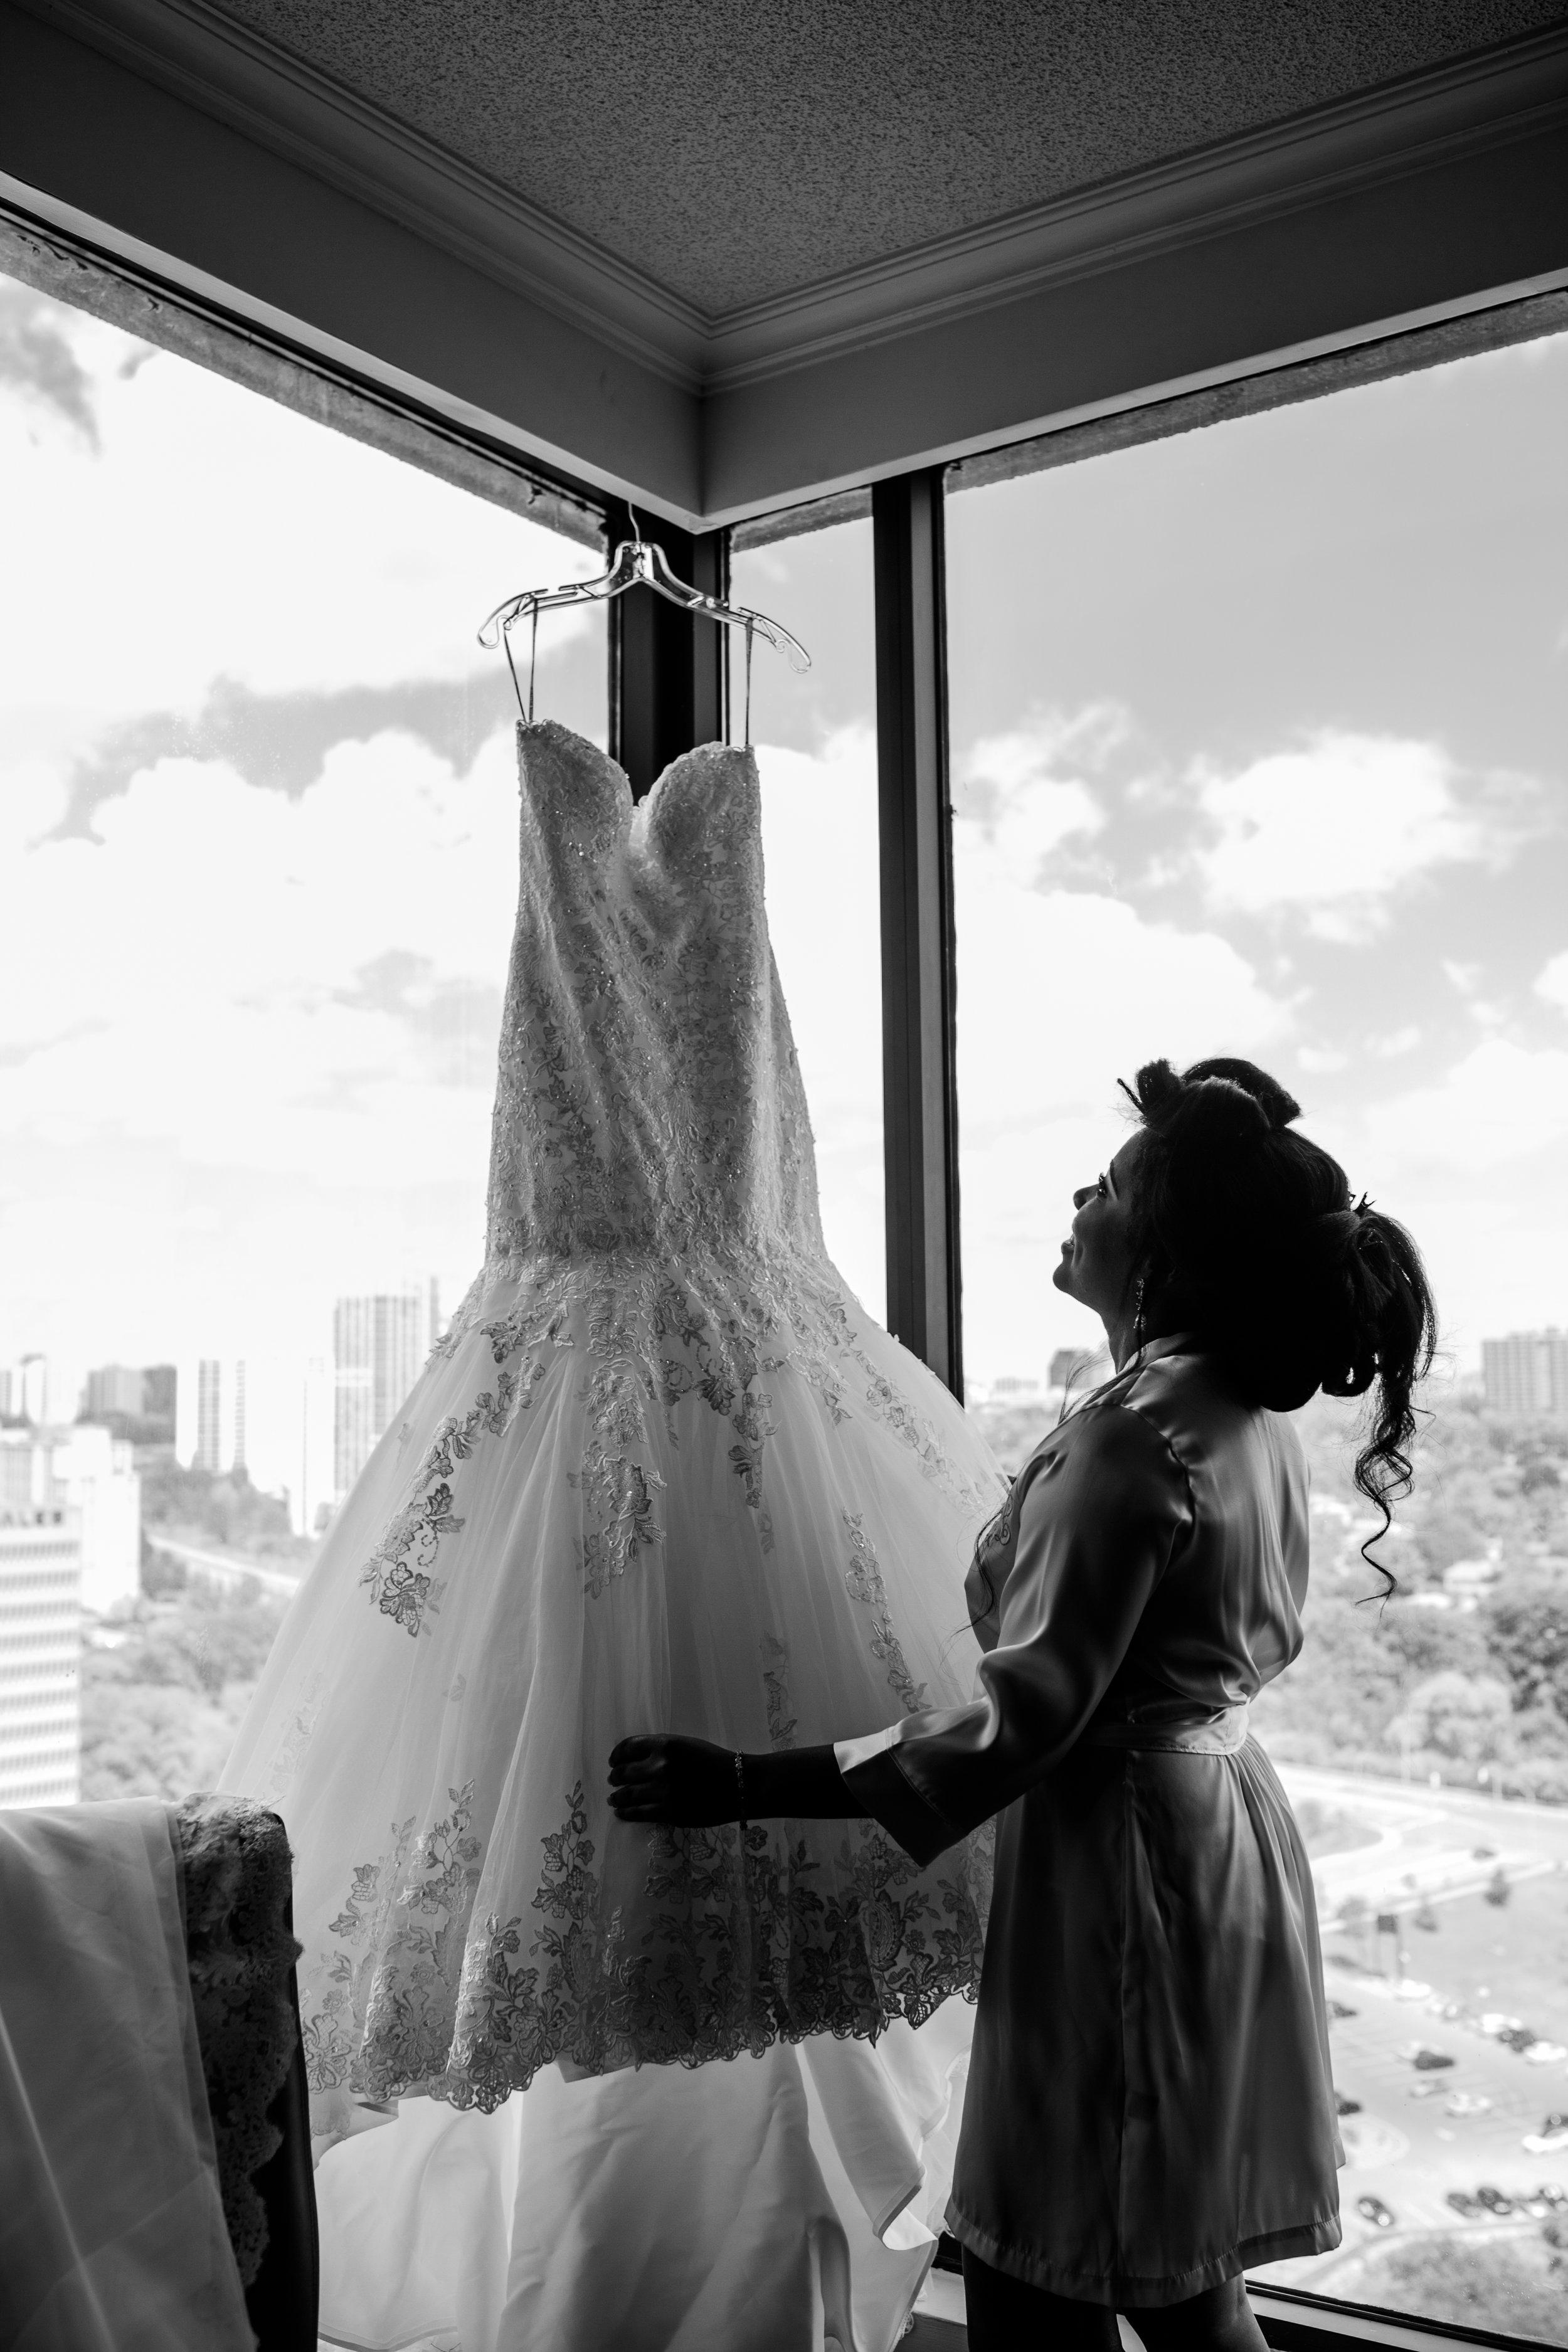 Lavinia_Carl_Wedding_Paradise_Banquet_Hall_Karimah_Gheddai_Photography_1